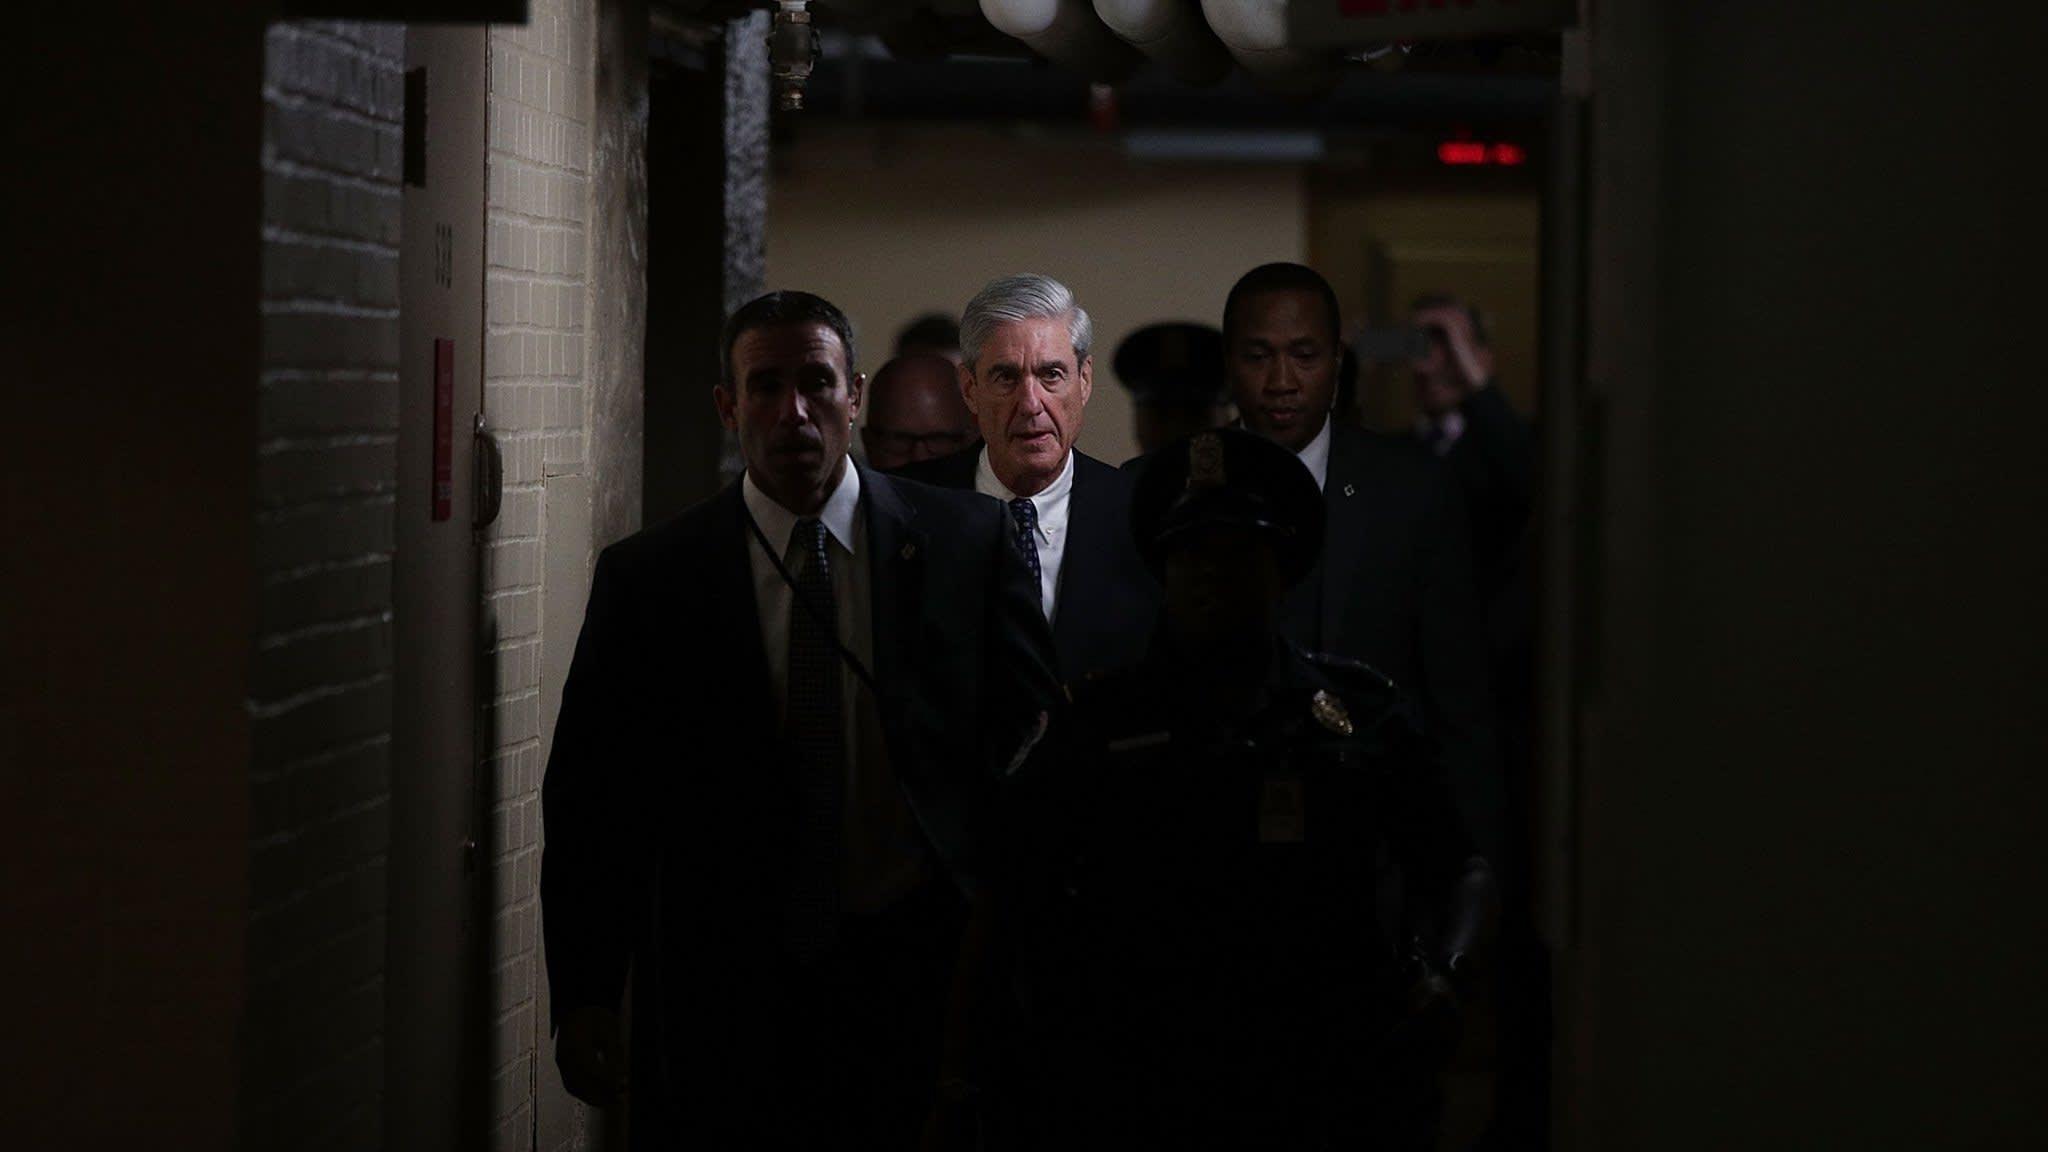 Robert Mueller's Russia investigation loses two prosecutors